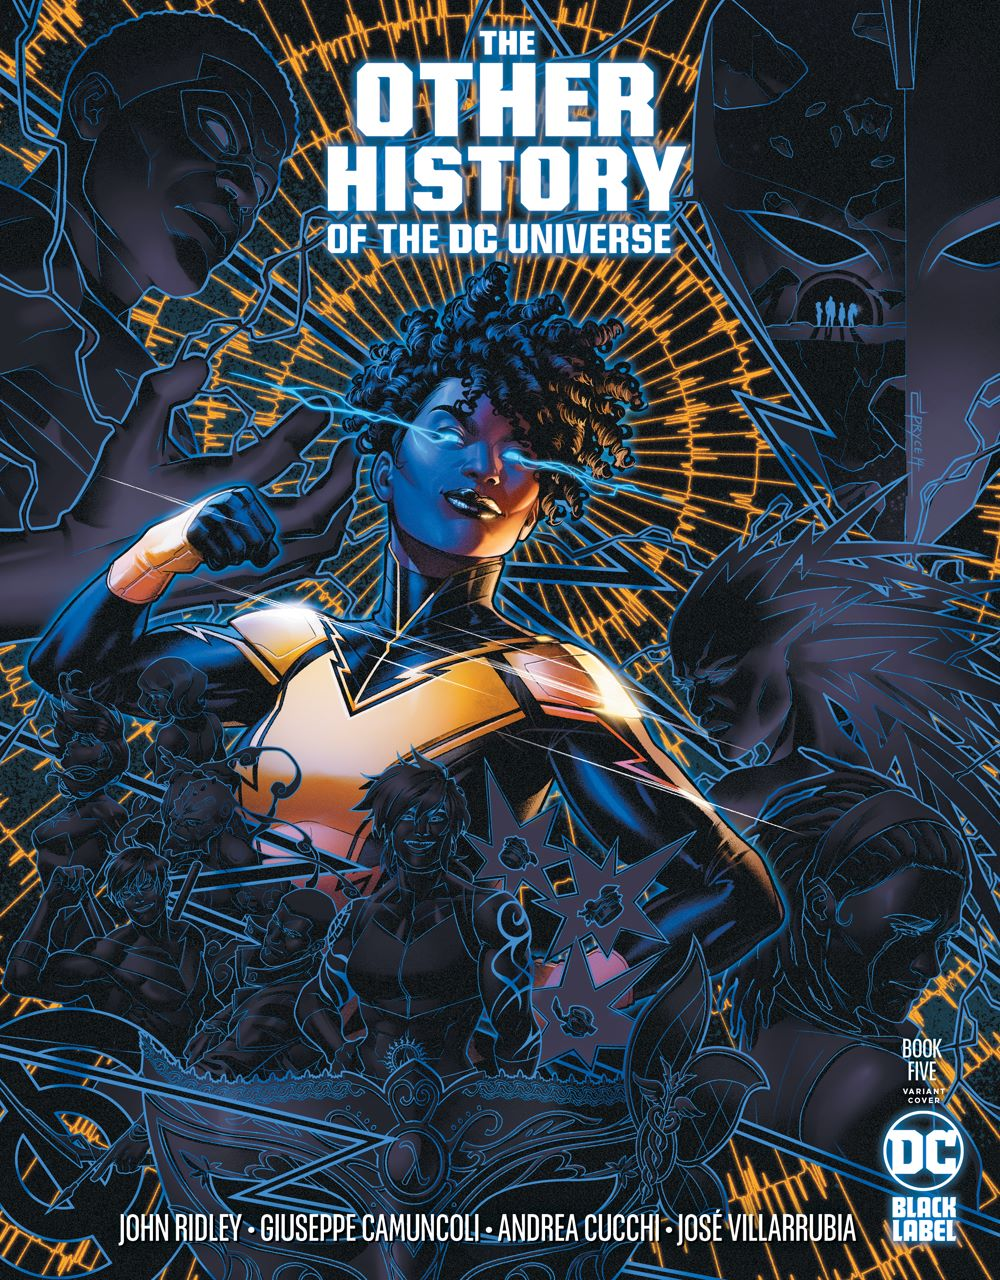 OHotDCU_Cv5_var DC Comics July 2021 Solicitations